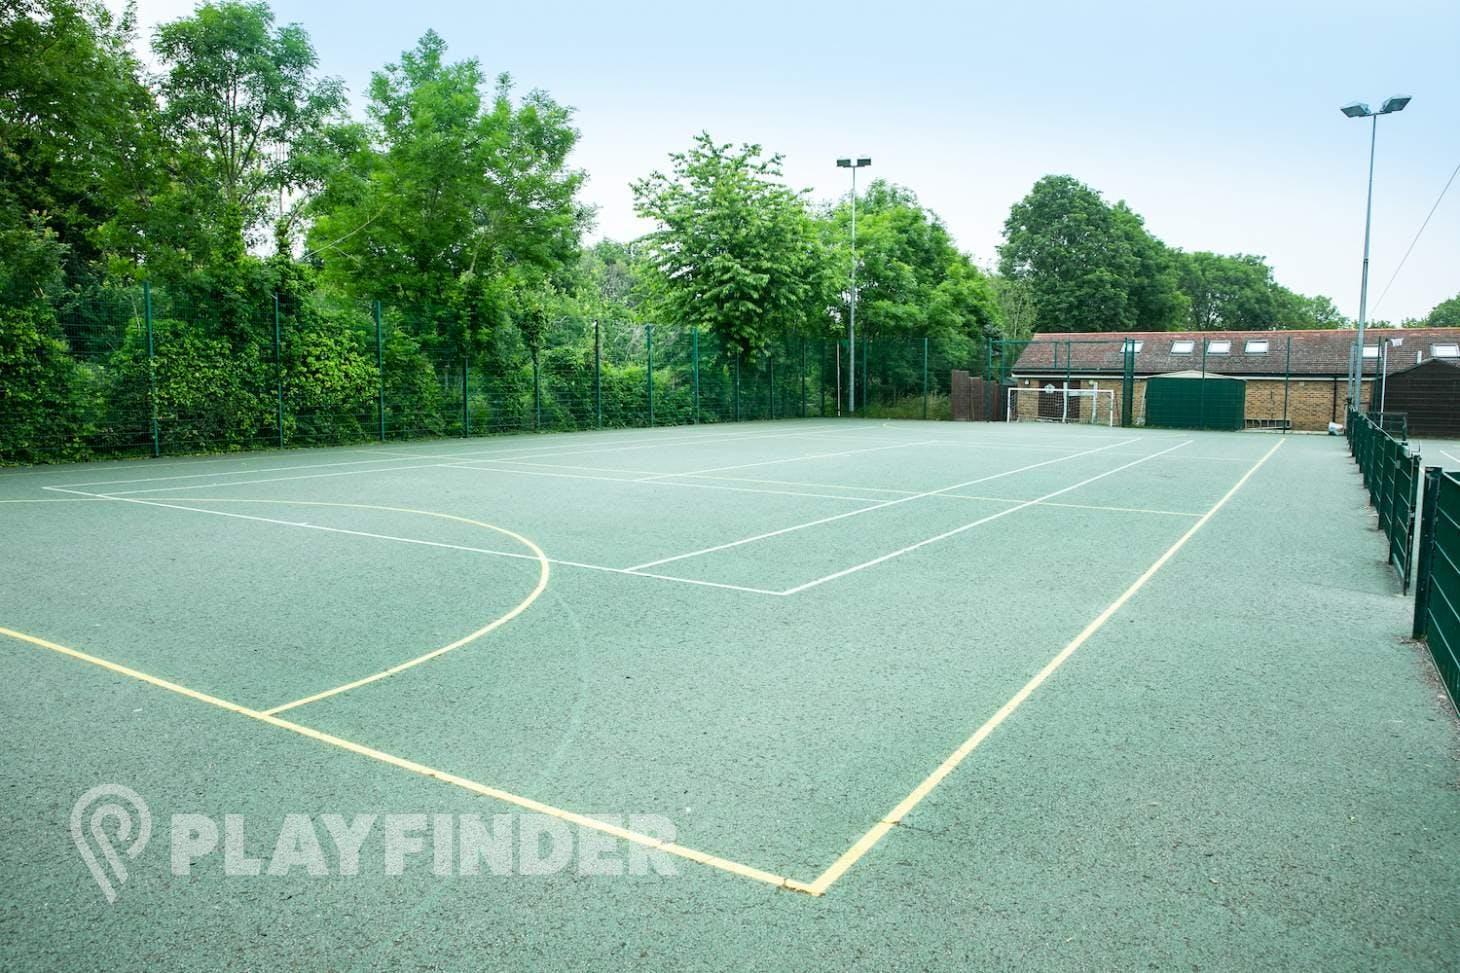 Stanley Primary School 5 a side   Hard (macadam) football pitch